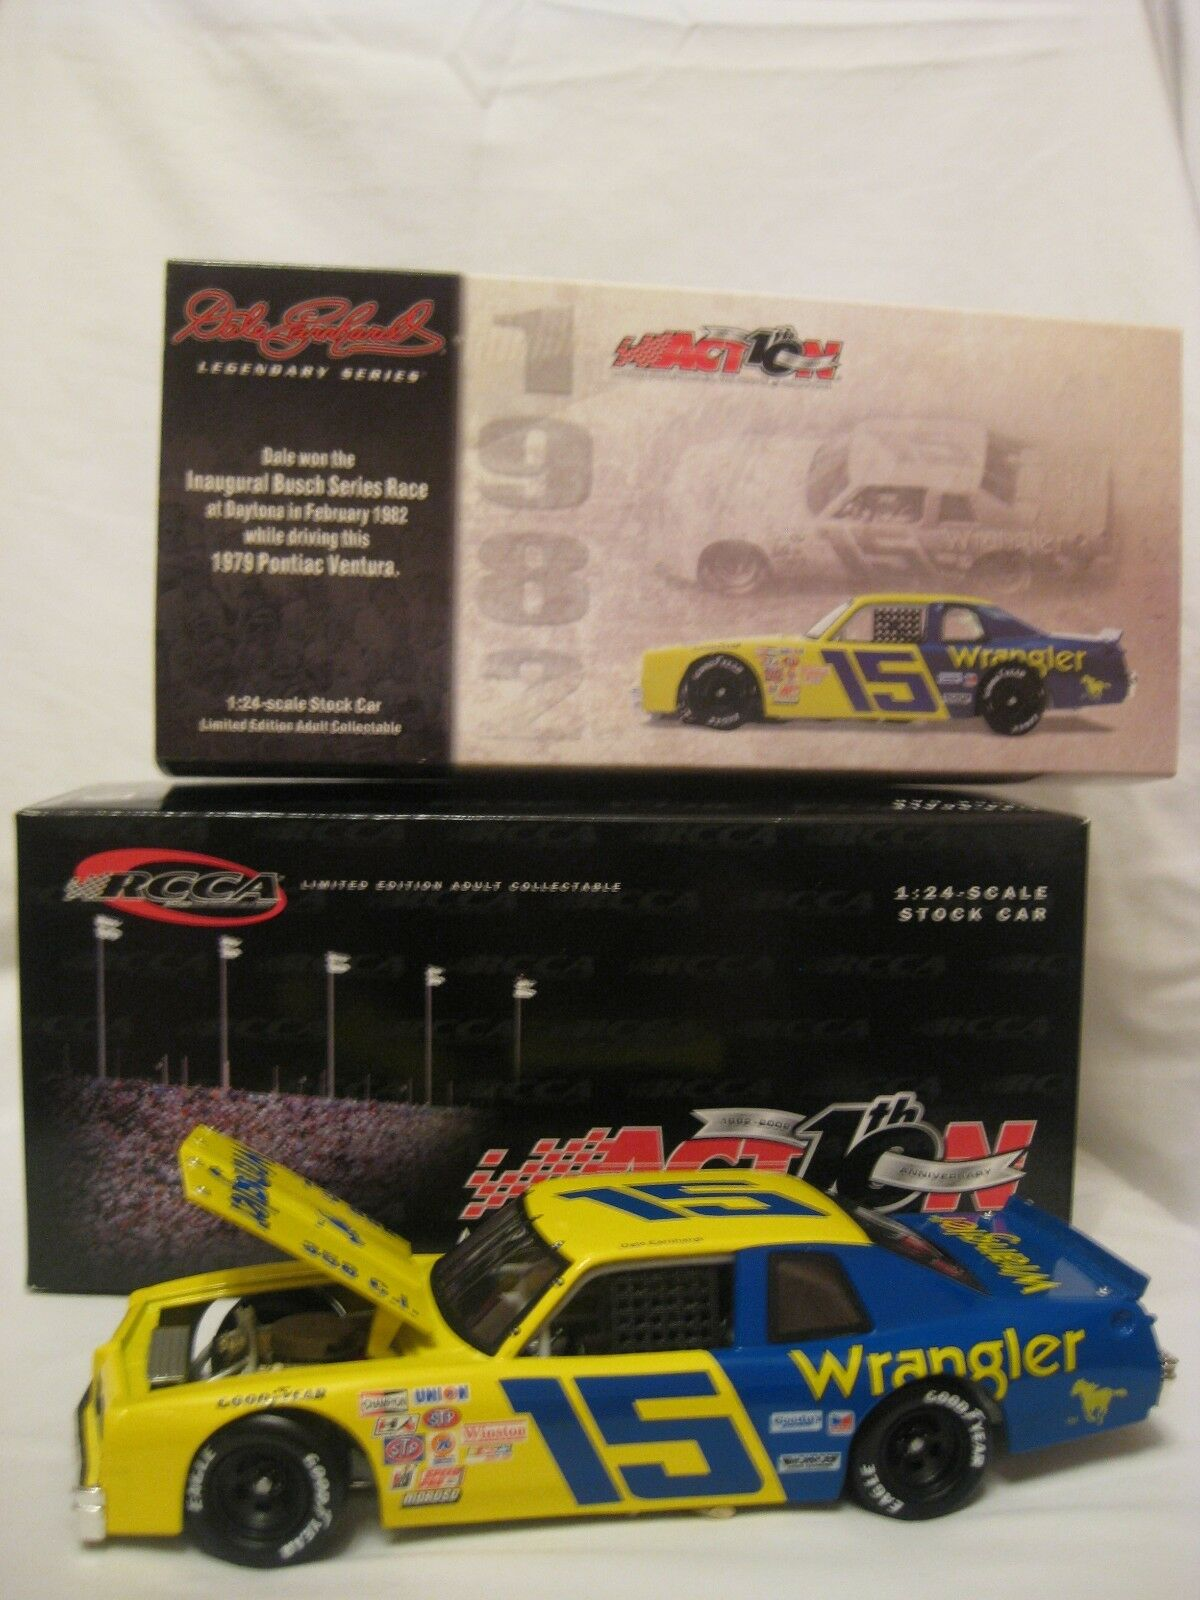 salida 1979 Wrangler Wrangler Wrangler Pontiac  15 Dale Earnhardt Sr 1 24 Diecast Coleccionables coche  deportes calientes